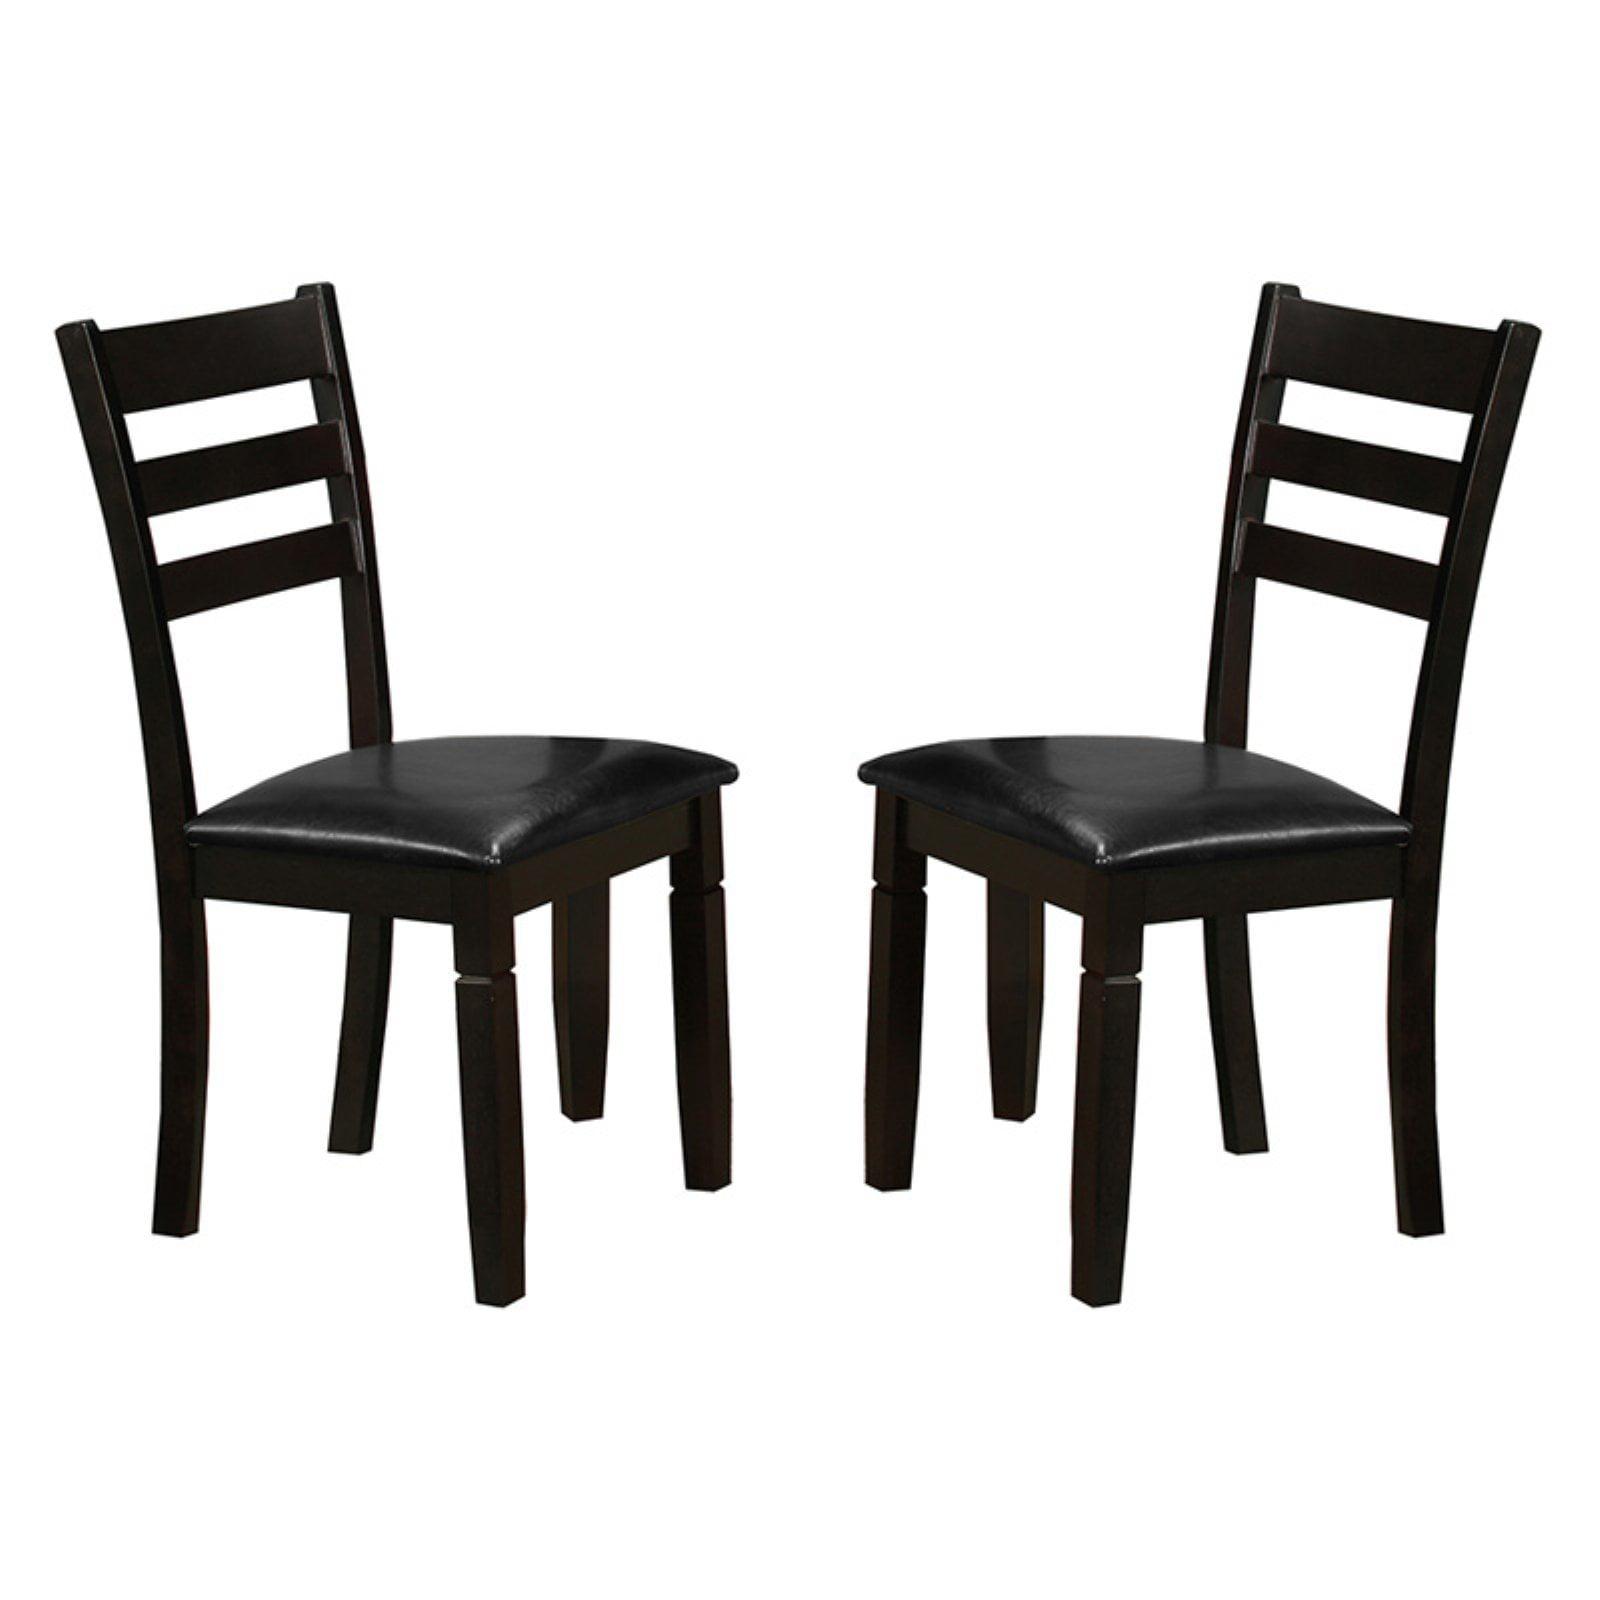 Milton Greens Stars Vigo Dining Chair - Set of 2